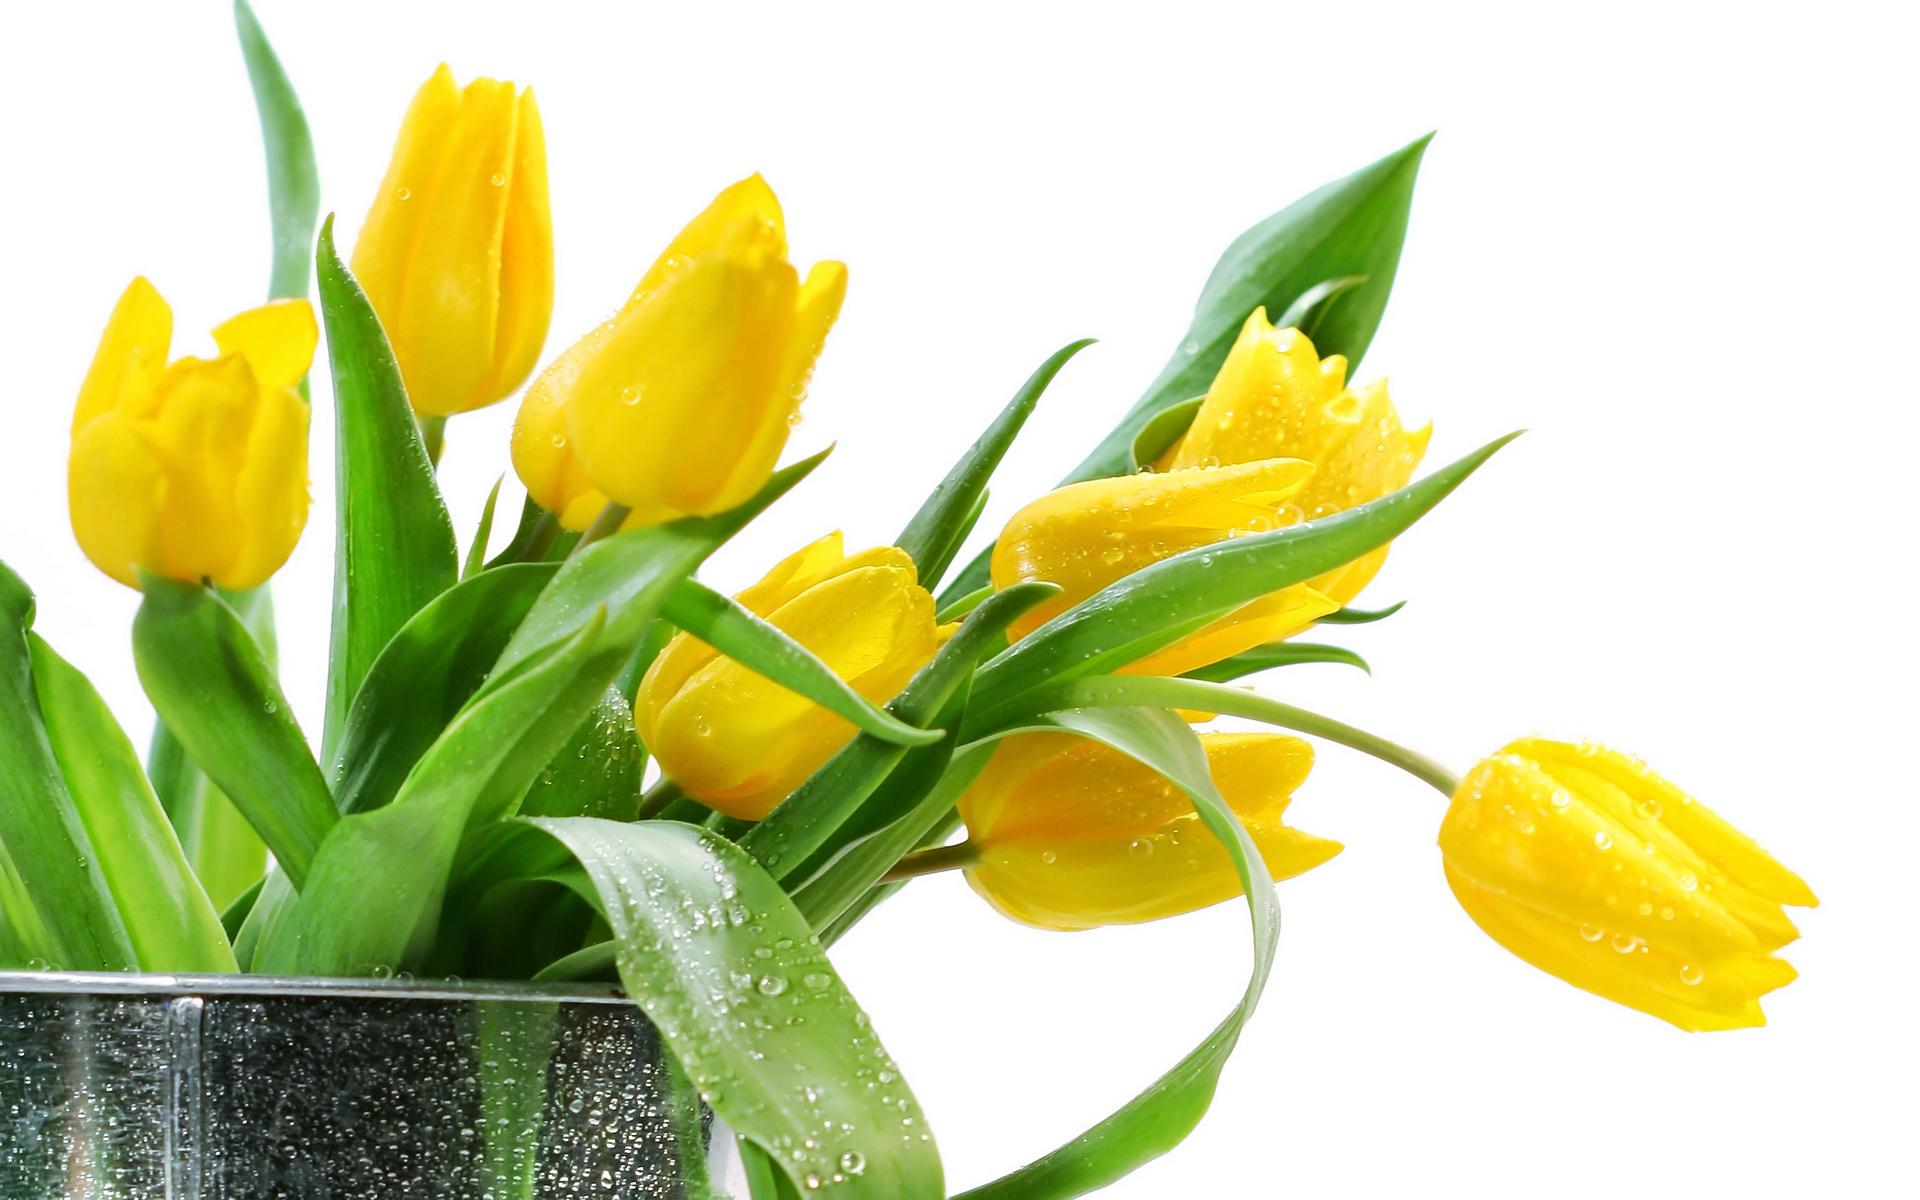 Wallpaper tulips yellow flowers bouquet 1920x1200 wallhaven tulips yellow flowers bouquet izmirmasajfo